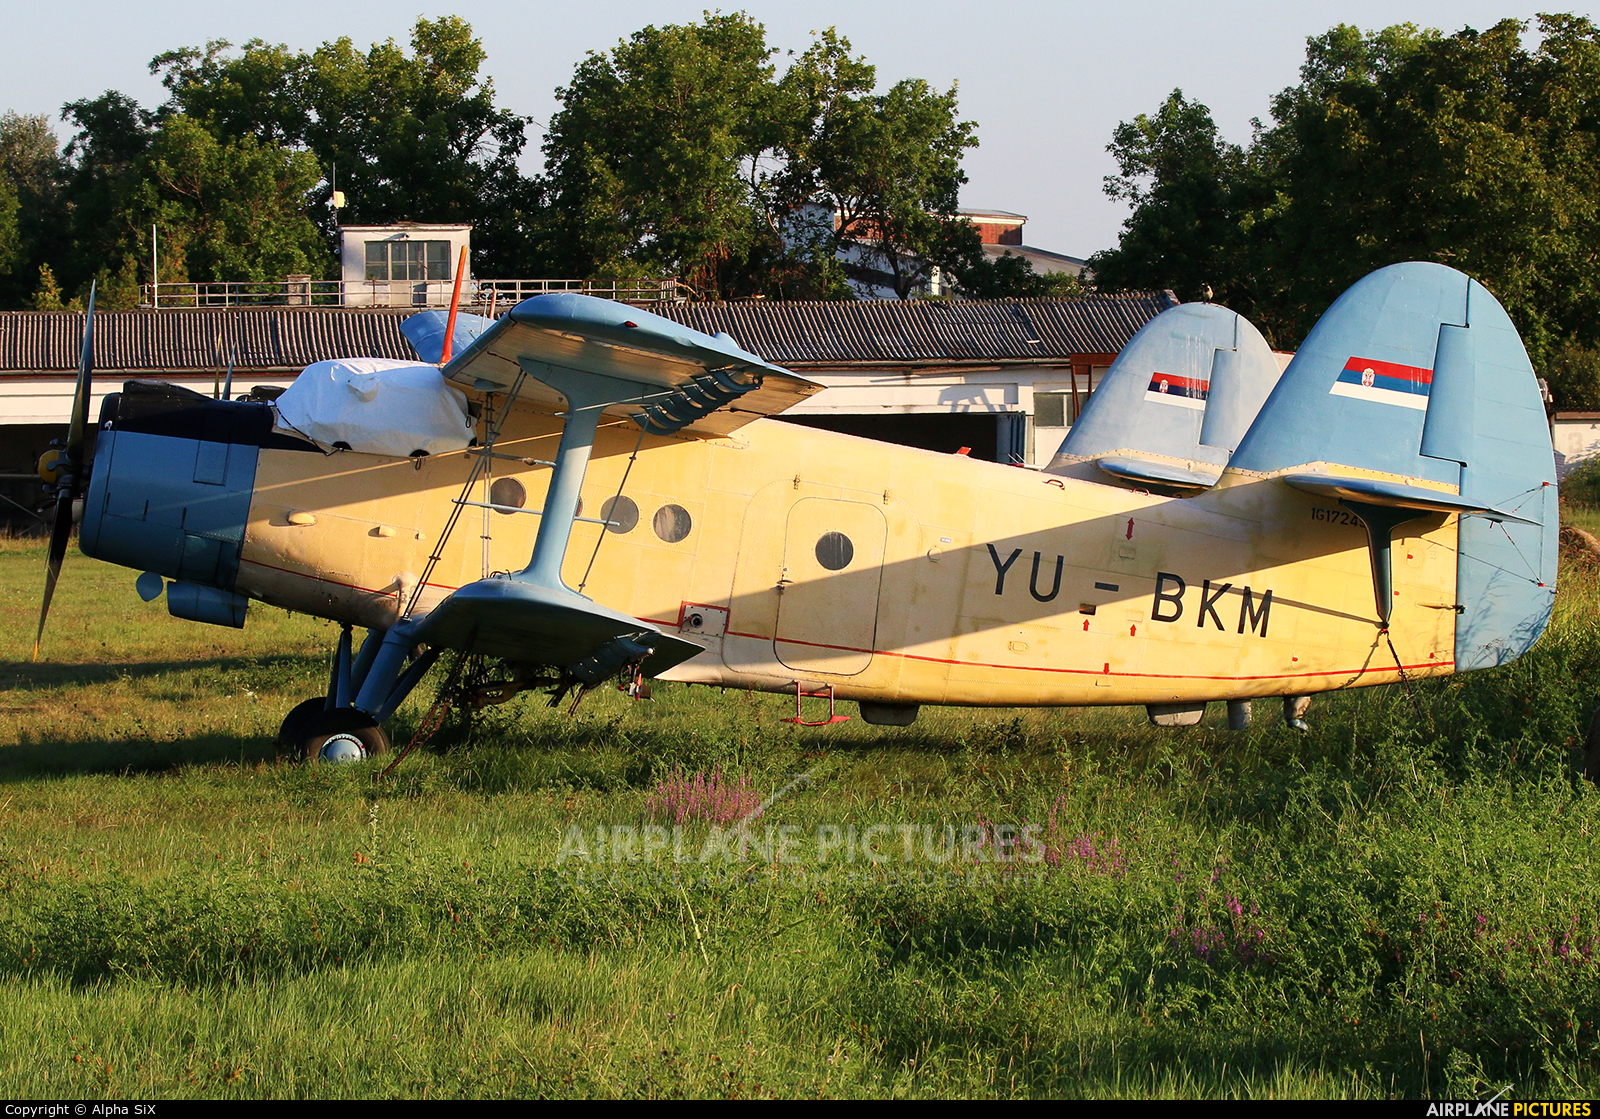 JAT Privredna Avijacija YU-BKM aircraft at Belgrade - Lisičji Jarak